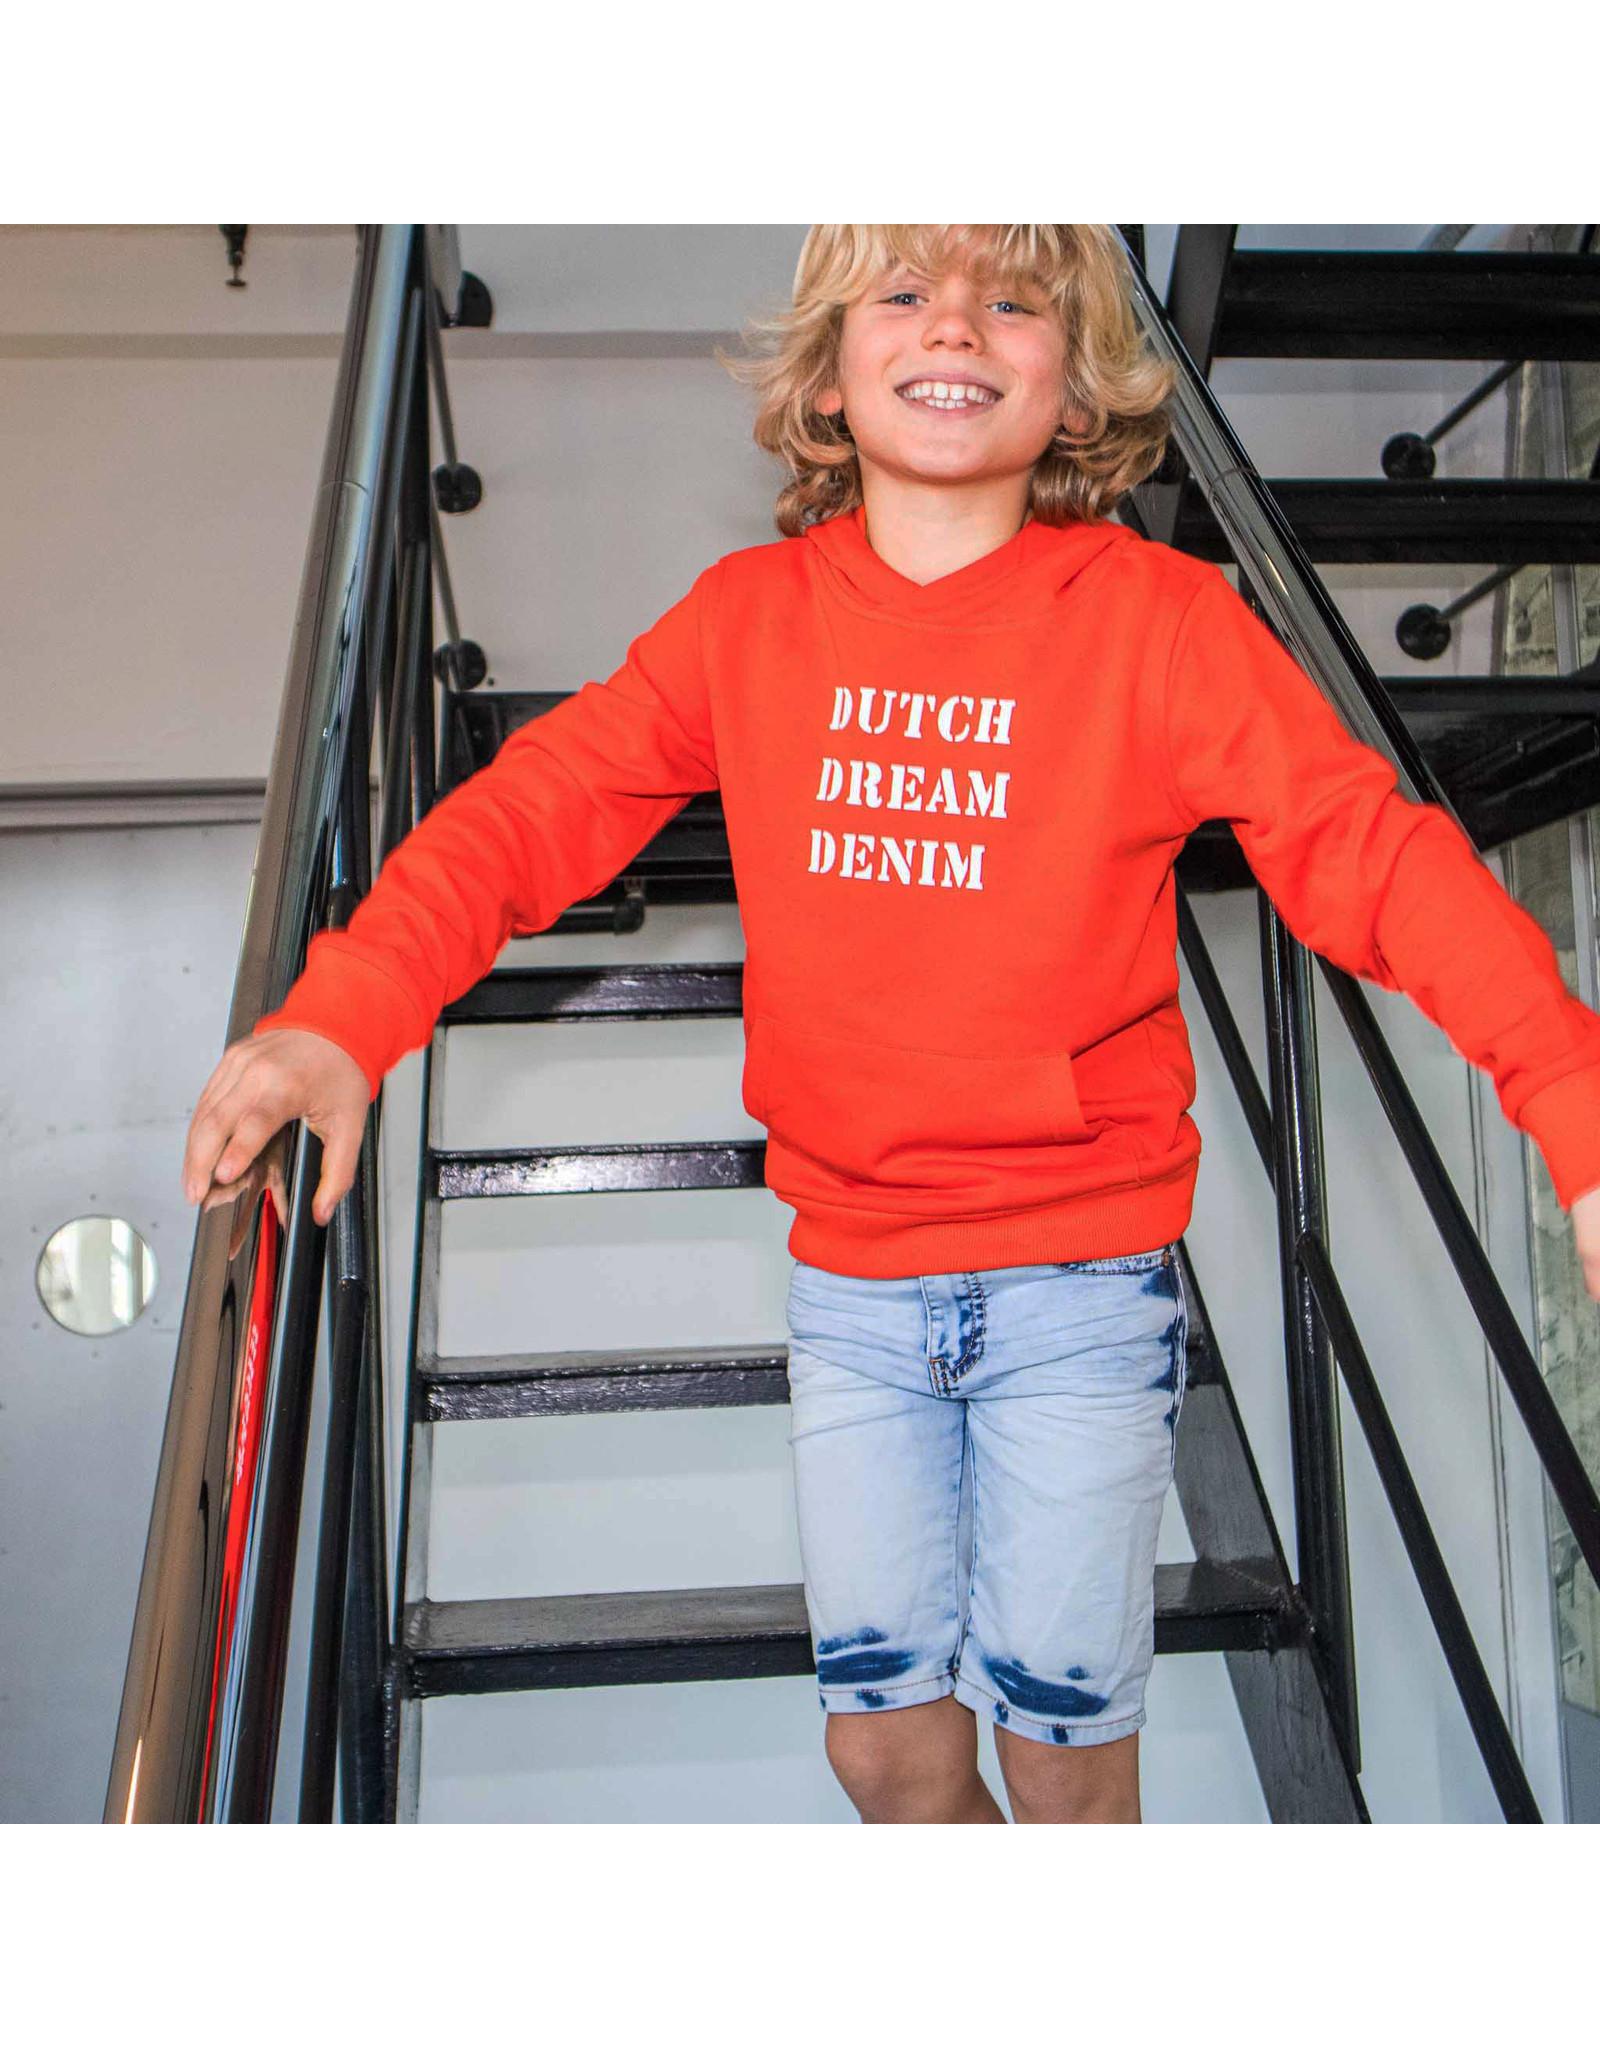 Dutch dream denim SEHEMU, EXTRA SLIM FIT Jogg jeans shorts